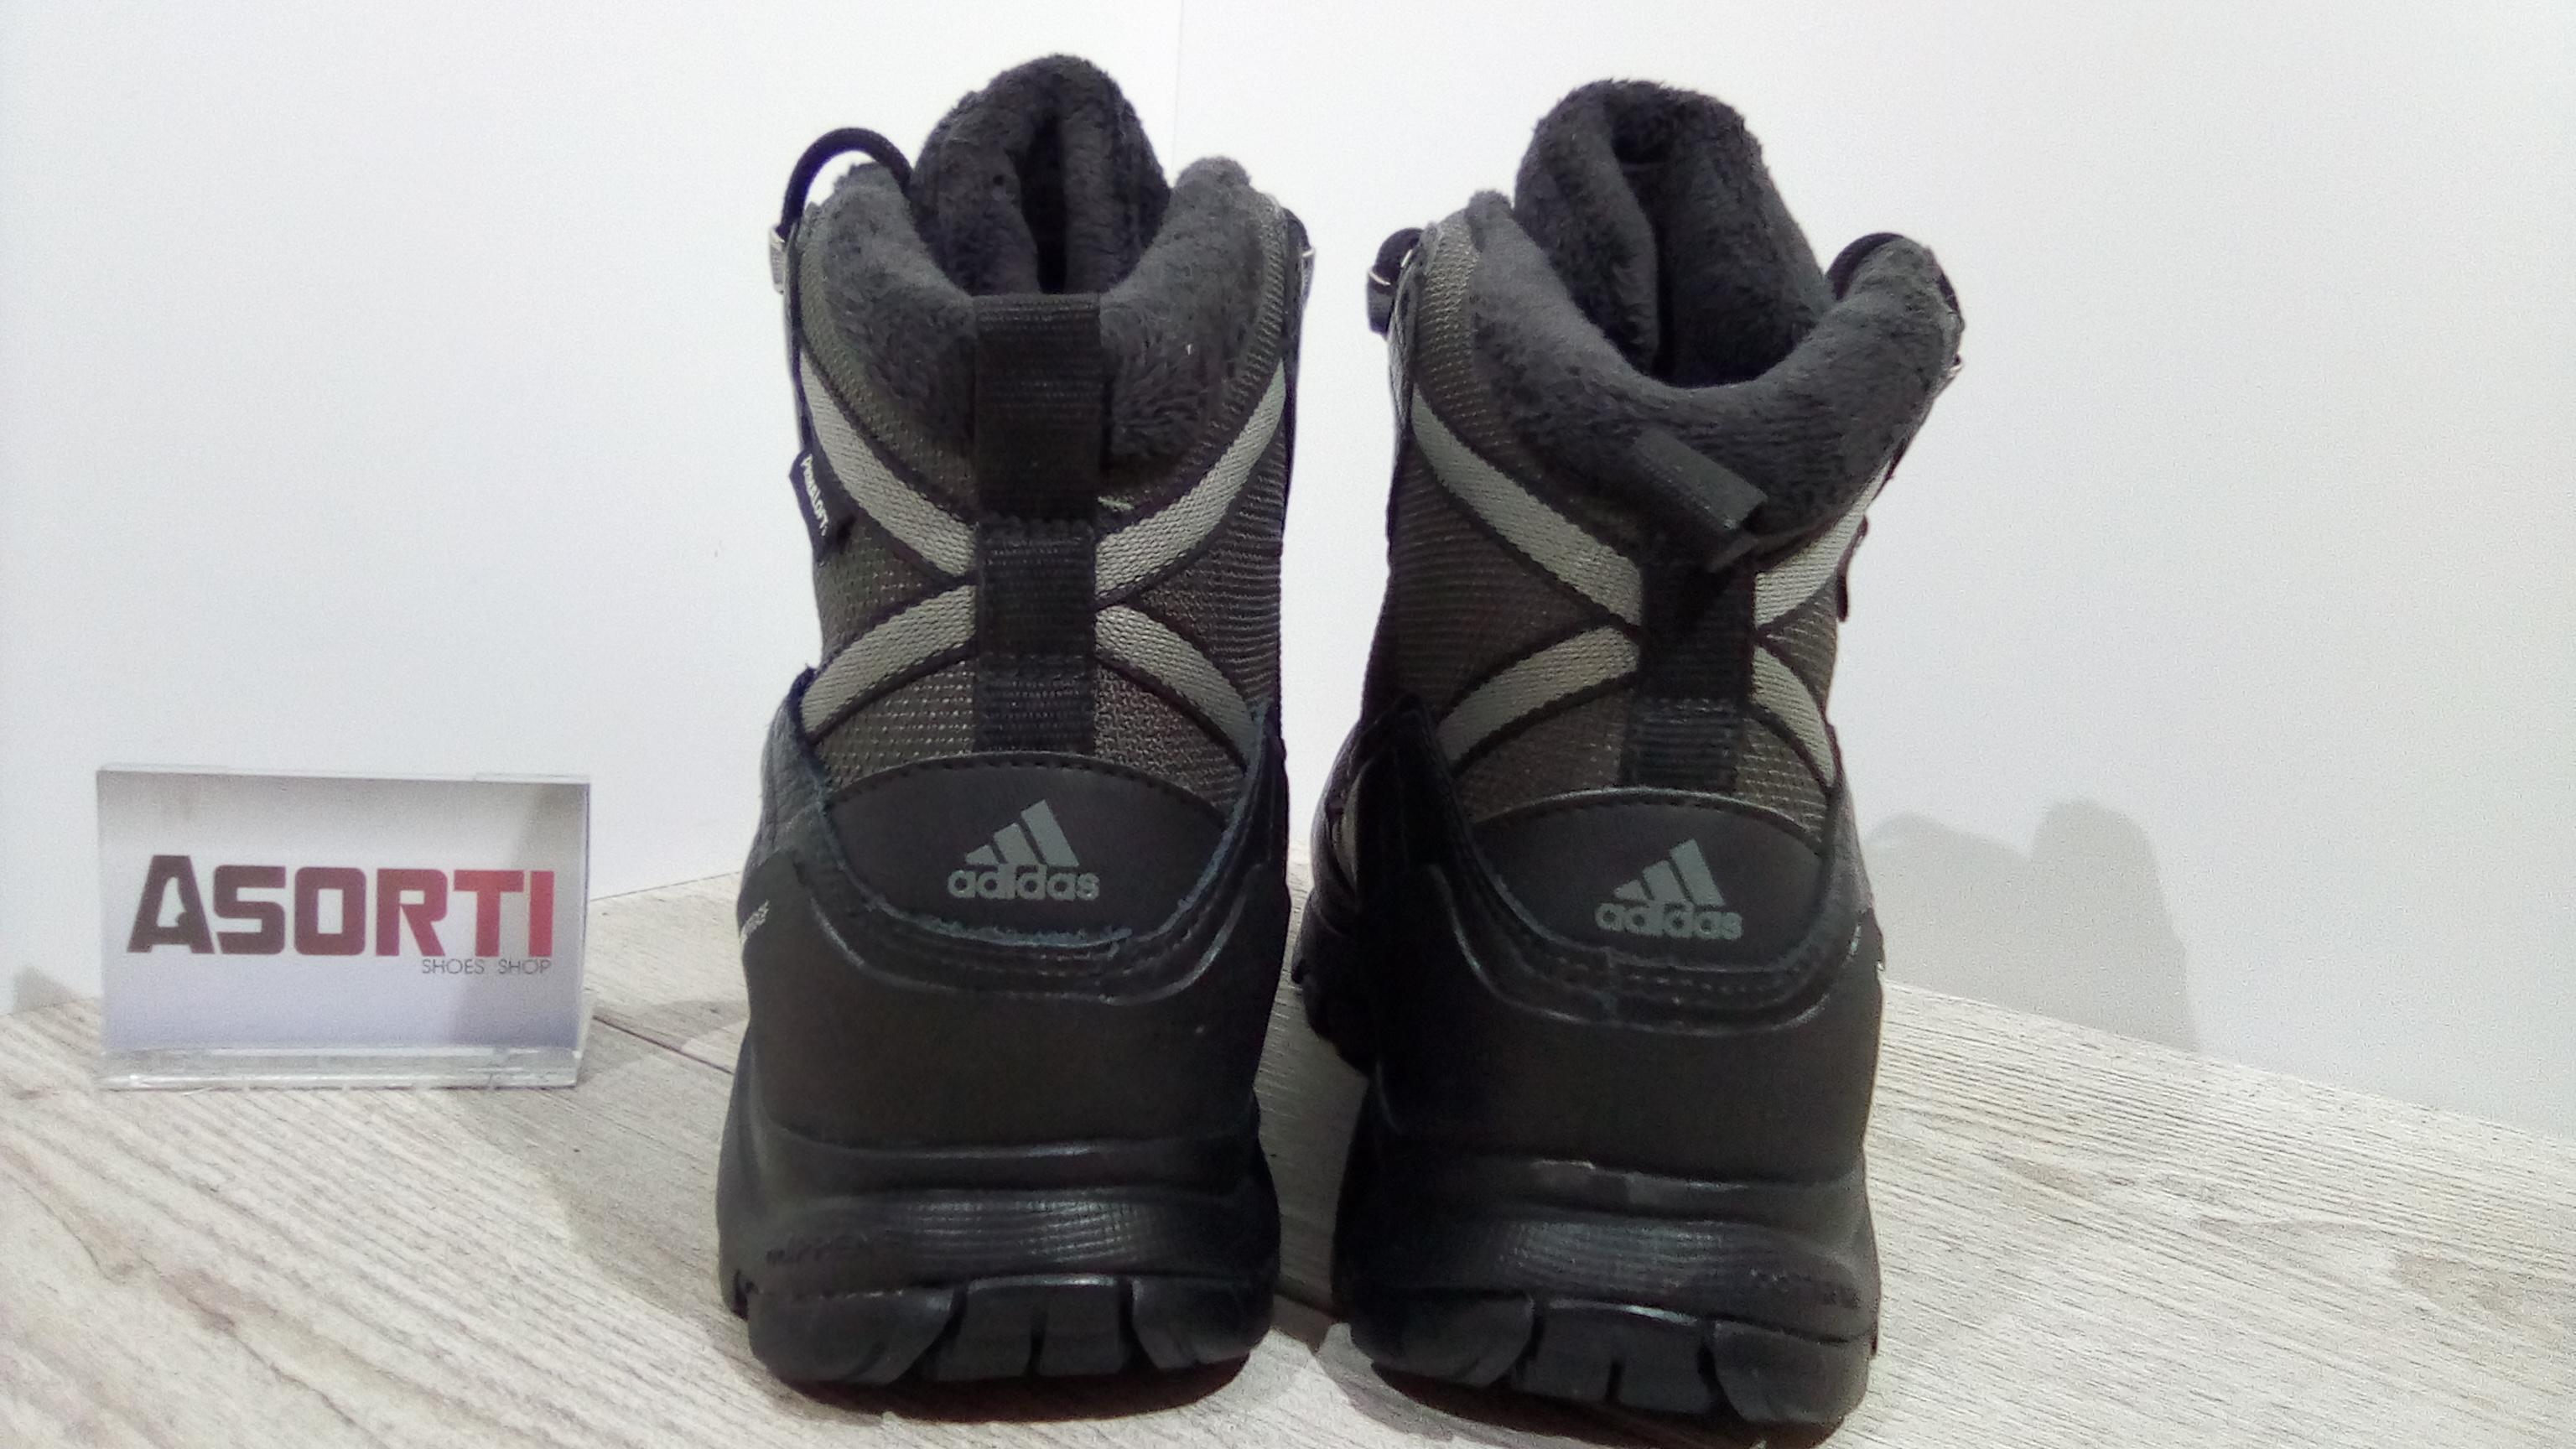 0c486045 Мужские зимние ботинки Adidas Winter Hiker CP PL W (G62621) черные ...